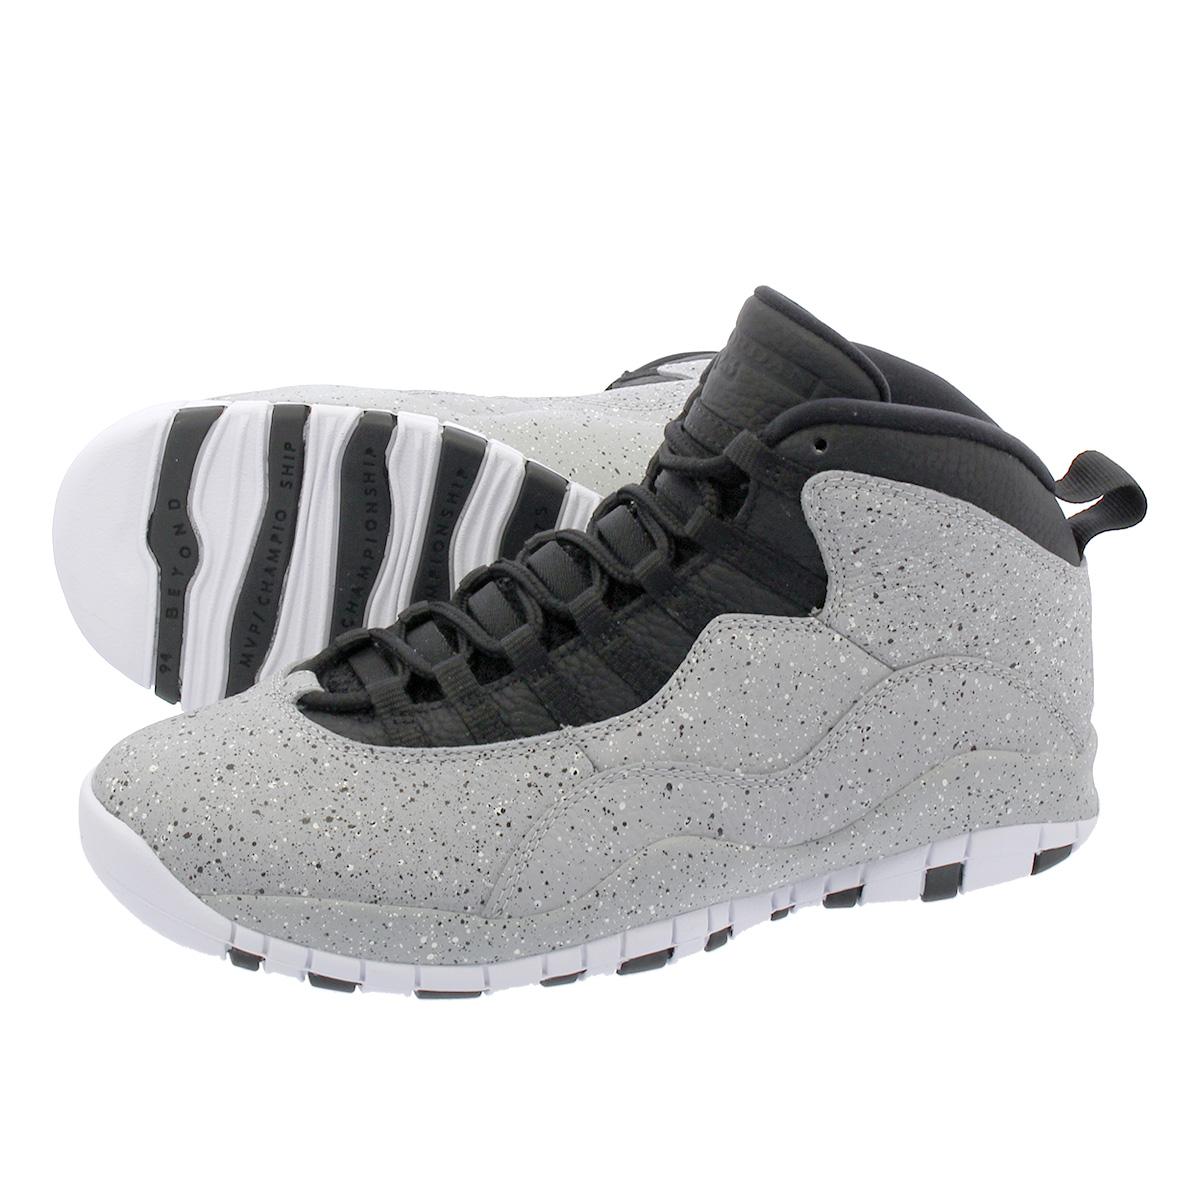 purchase cheap 33ef0 92b99 NIKE AIR JORDAN 10 RETRO Nike Air Jordan 10 nostalgic COOL GREY COOL GREY WHITE  310,805-062